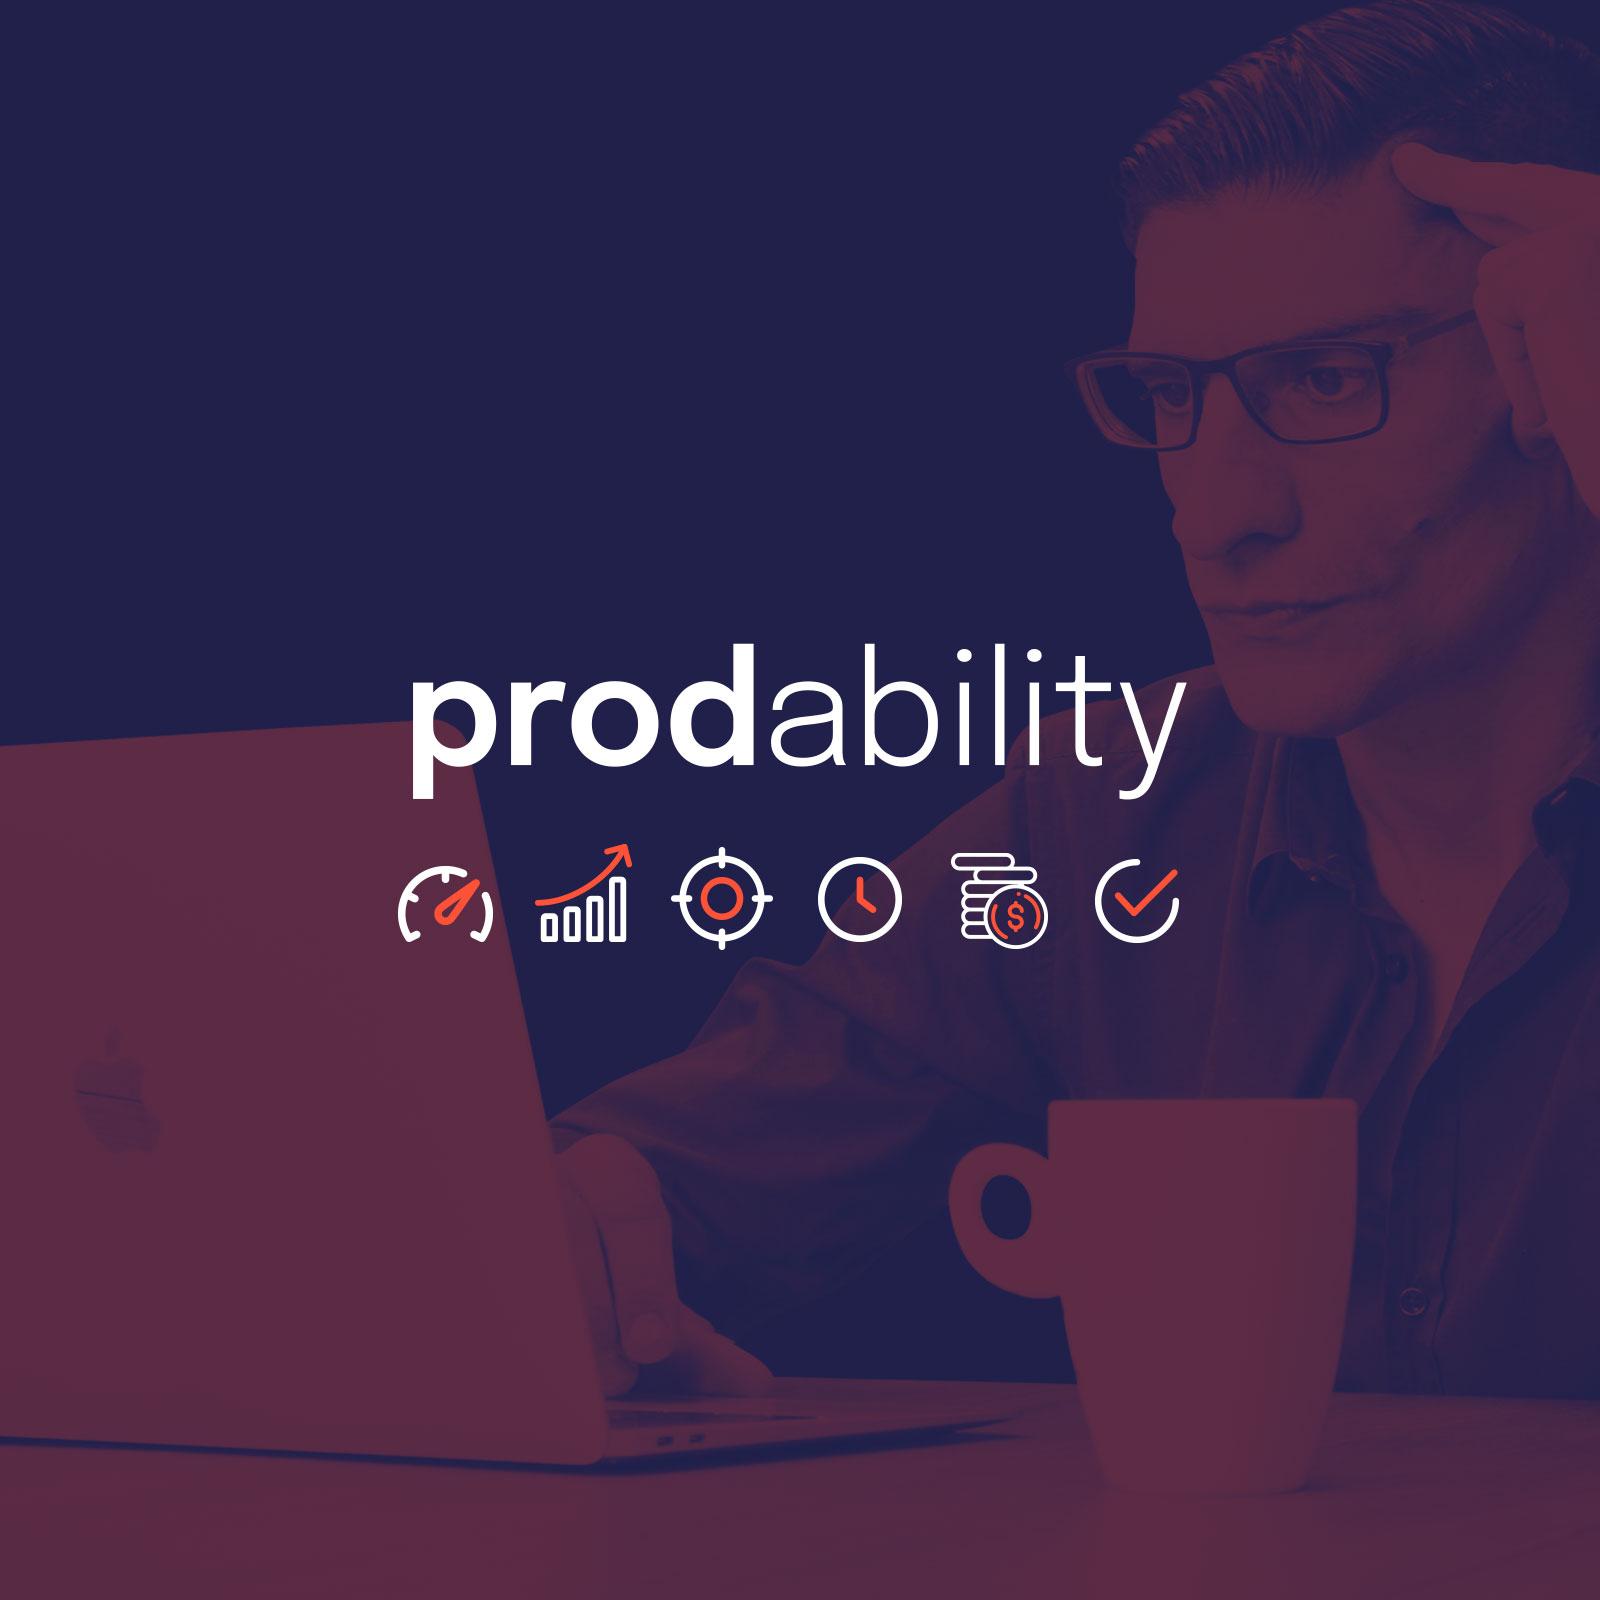 Prodability – Acconto offerta lancio